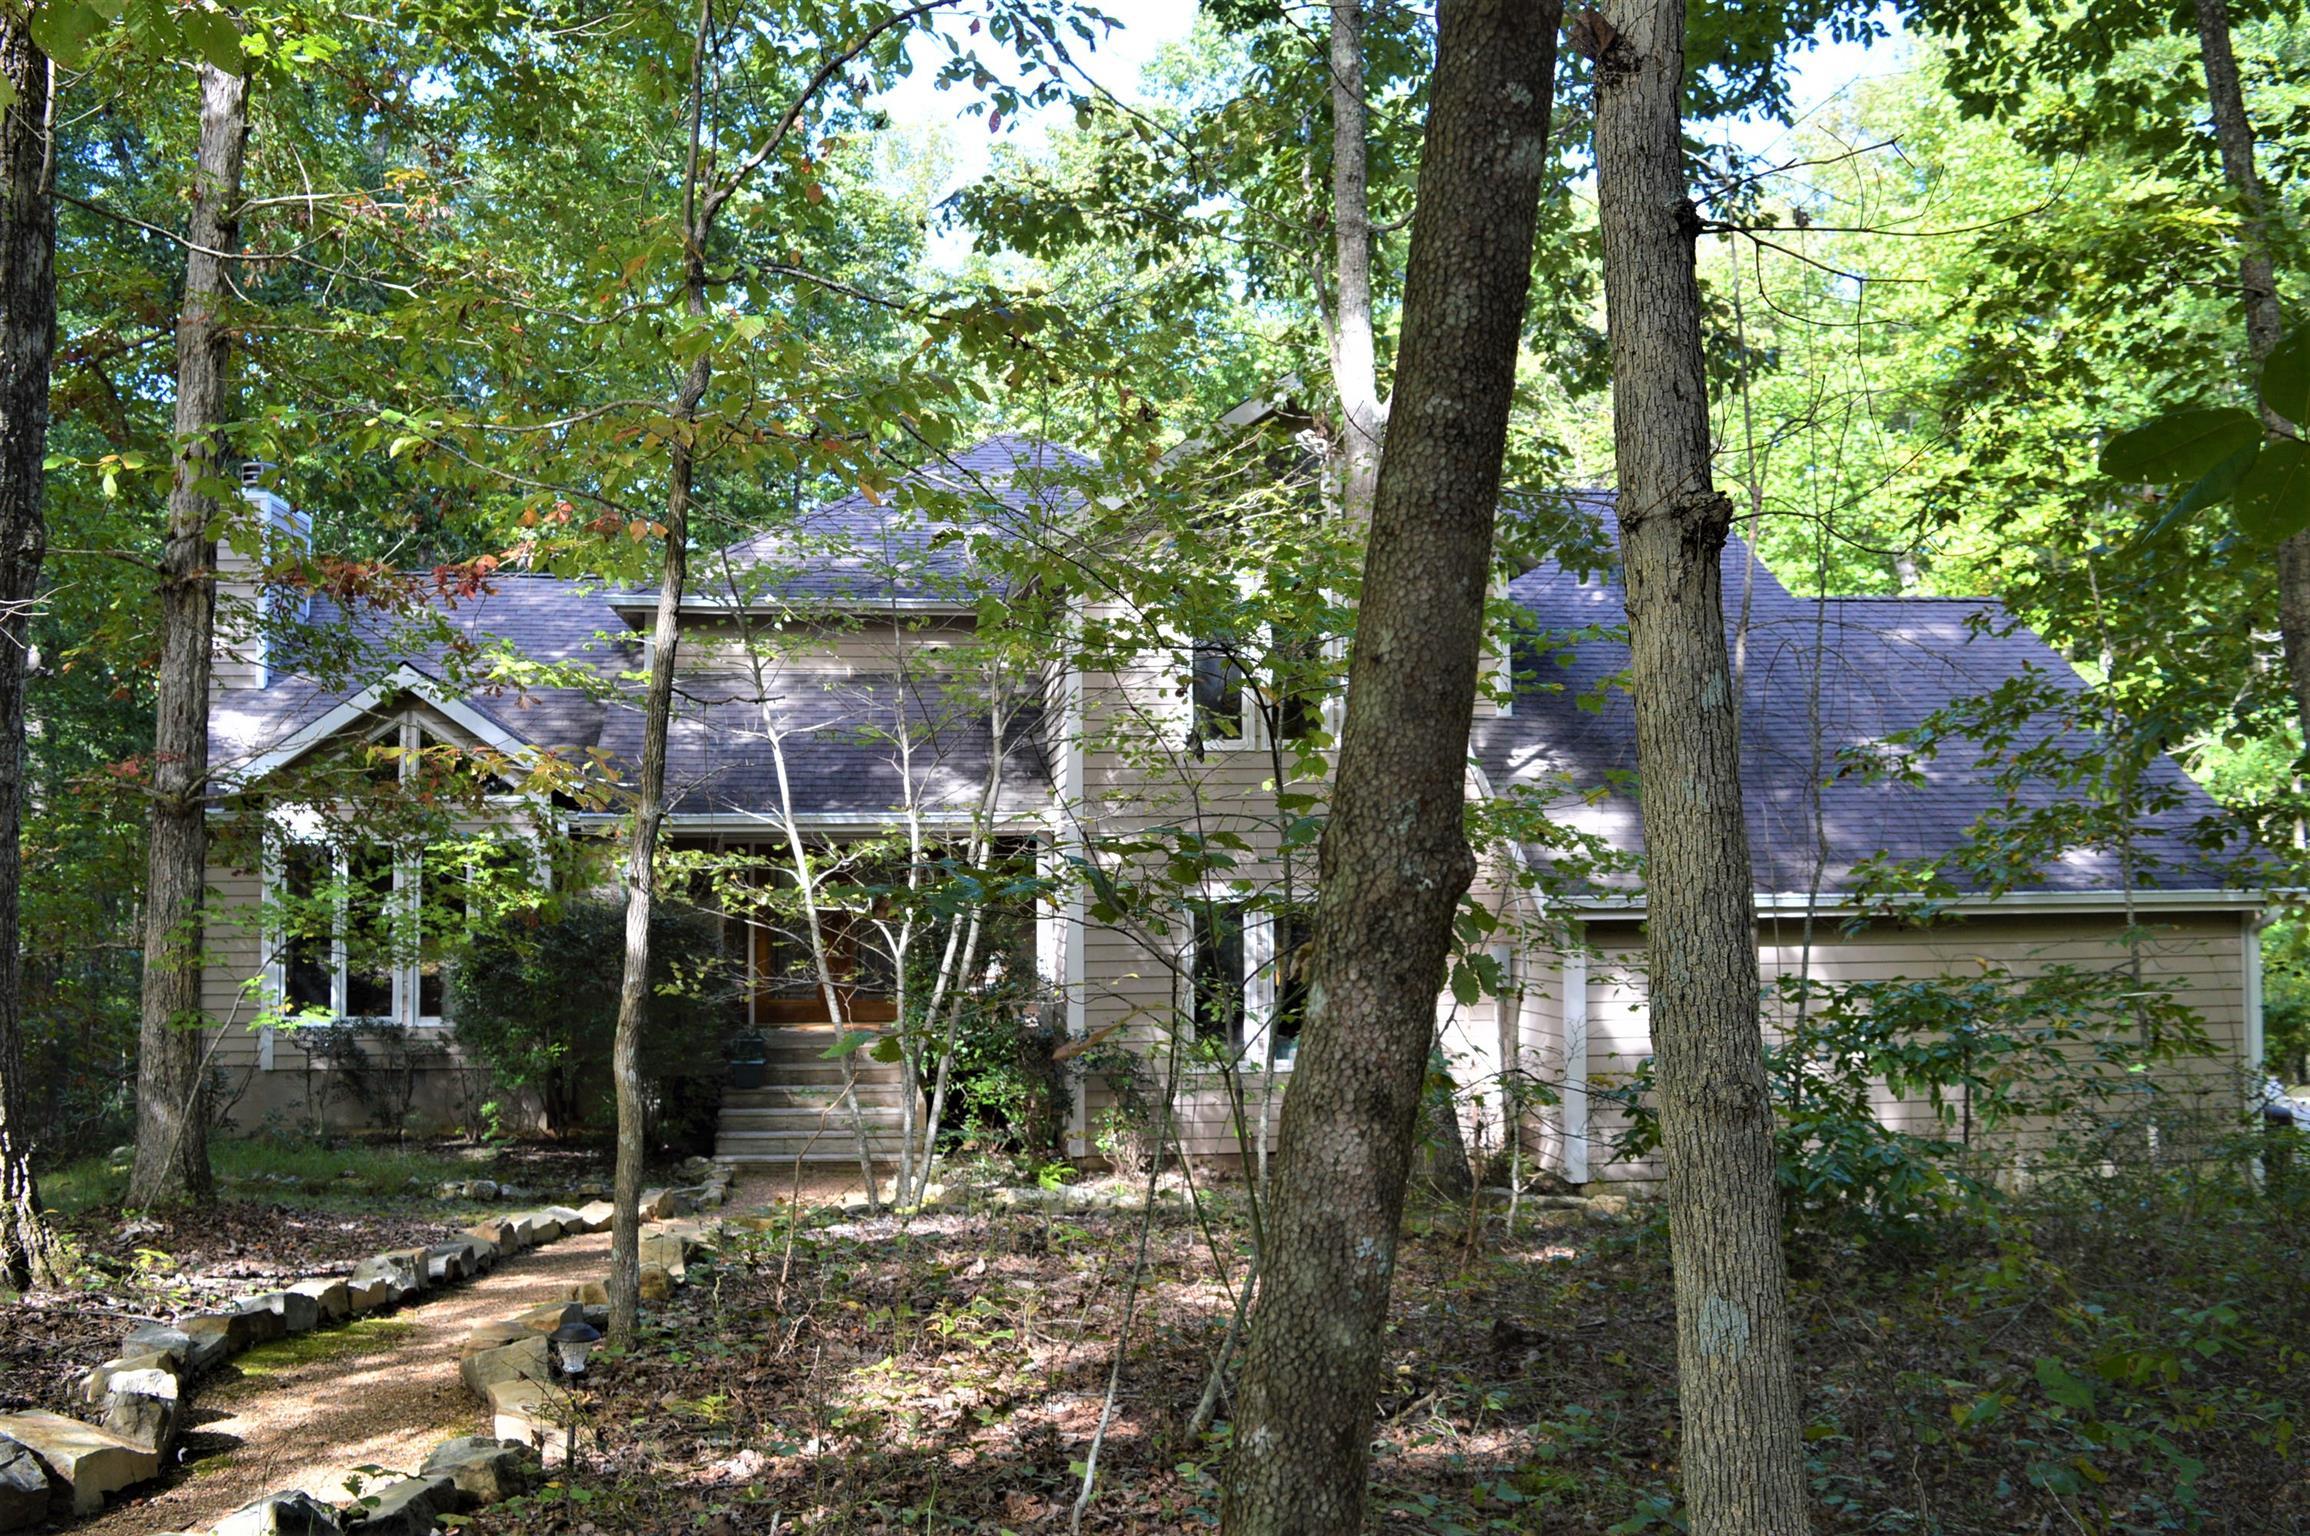 174 Carpenter Cir, Sewanee, TN 37375 - Sewanee, TN real estate listing